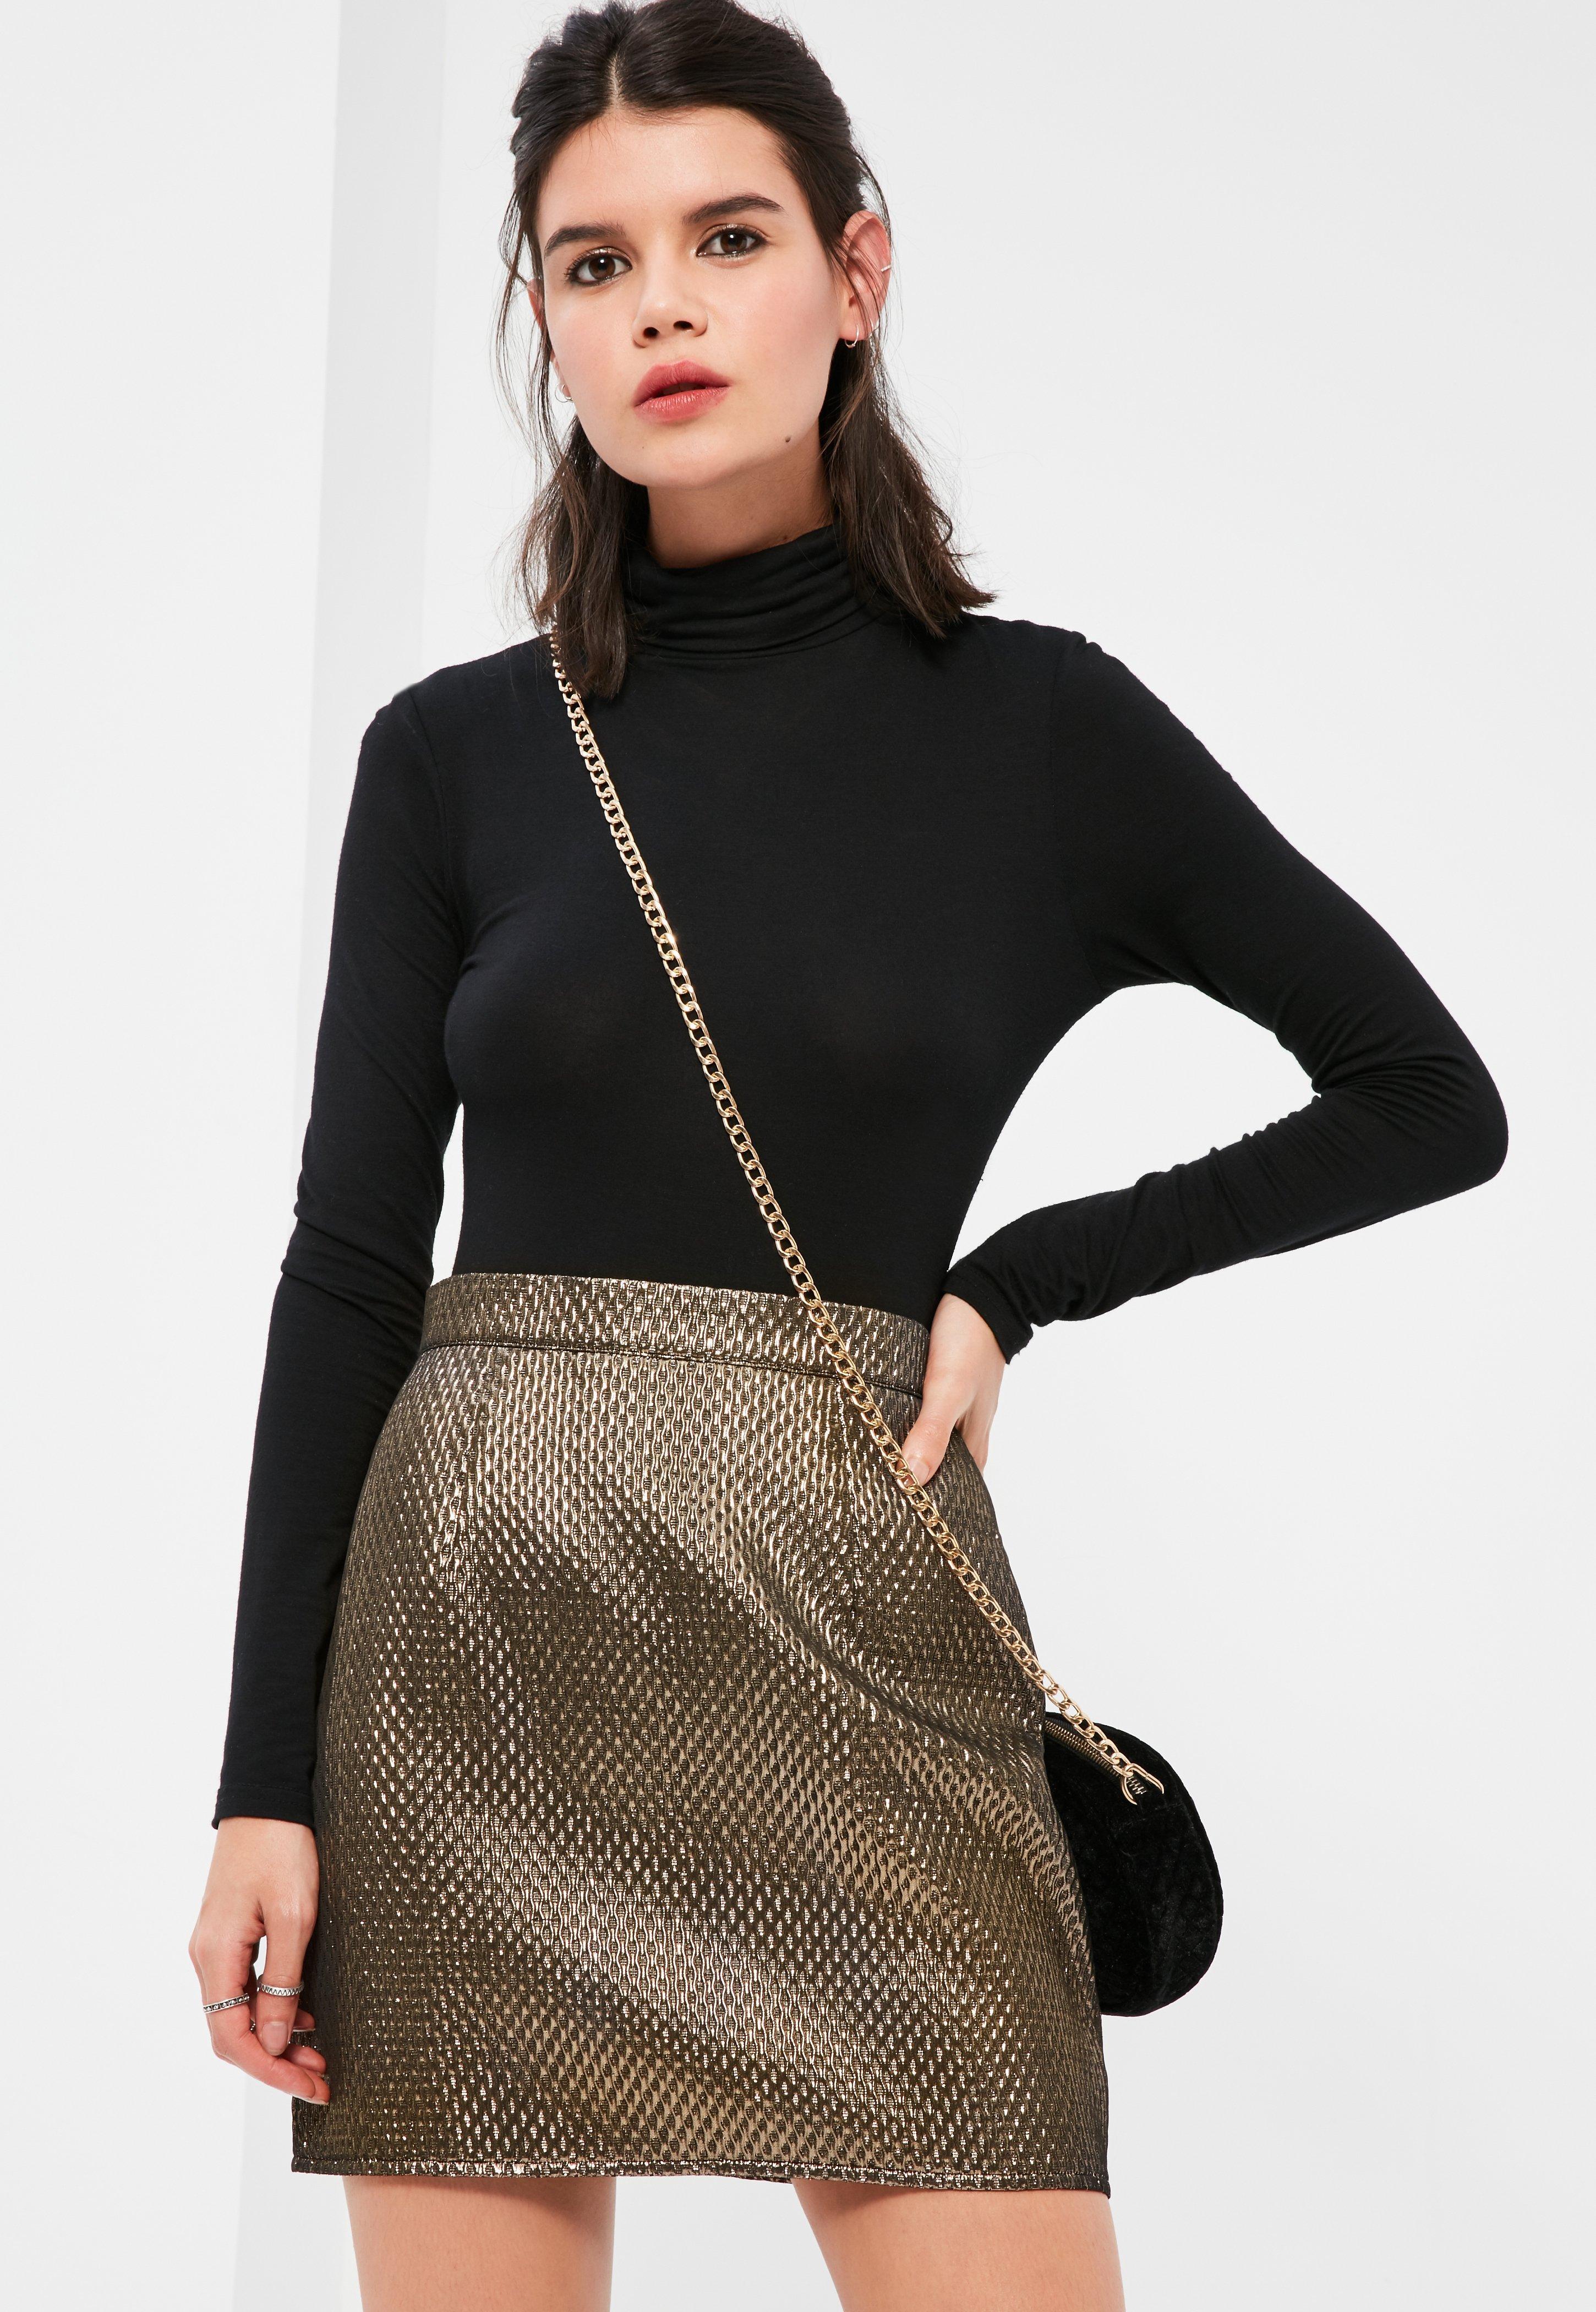 Minifalda petite texturizada metalizada exclusiva dorada  ab743113a4a7